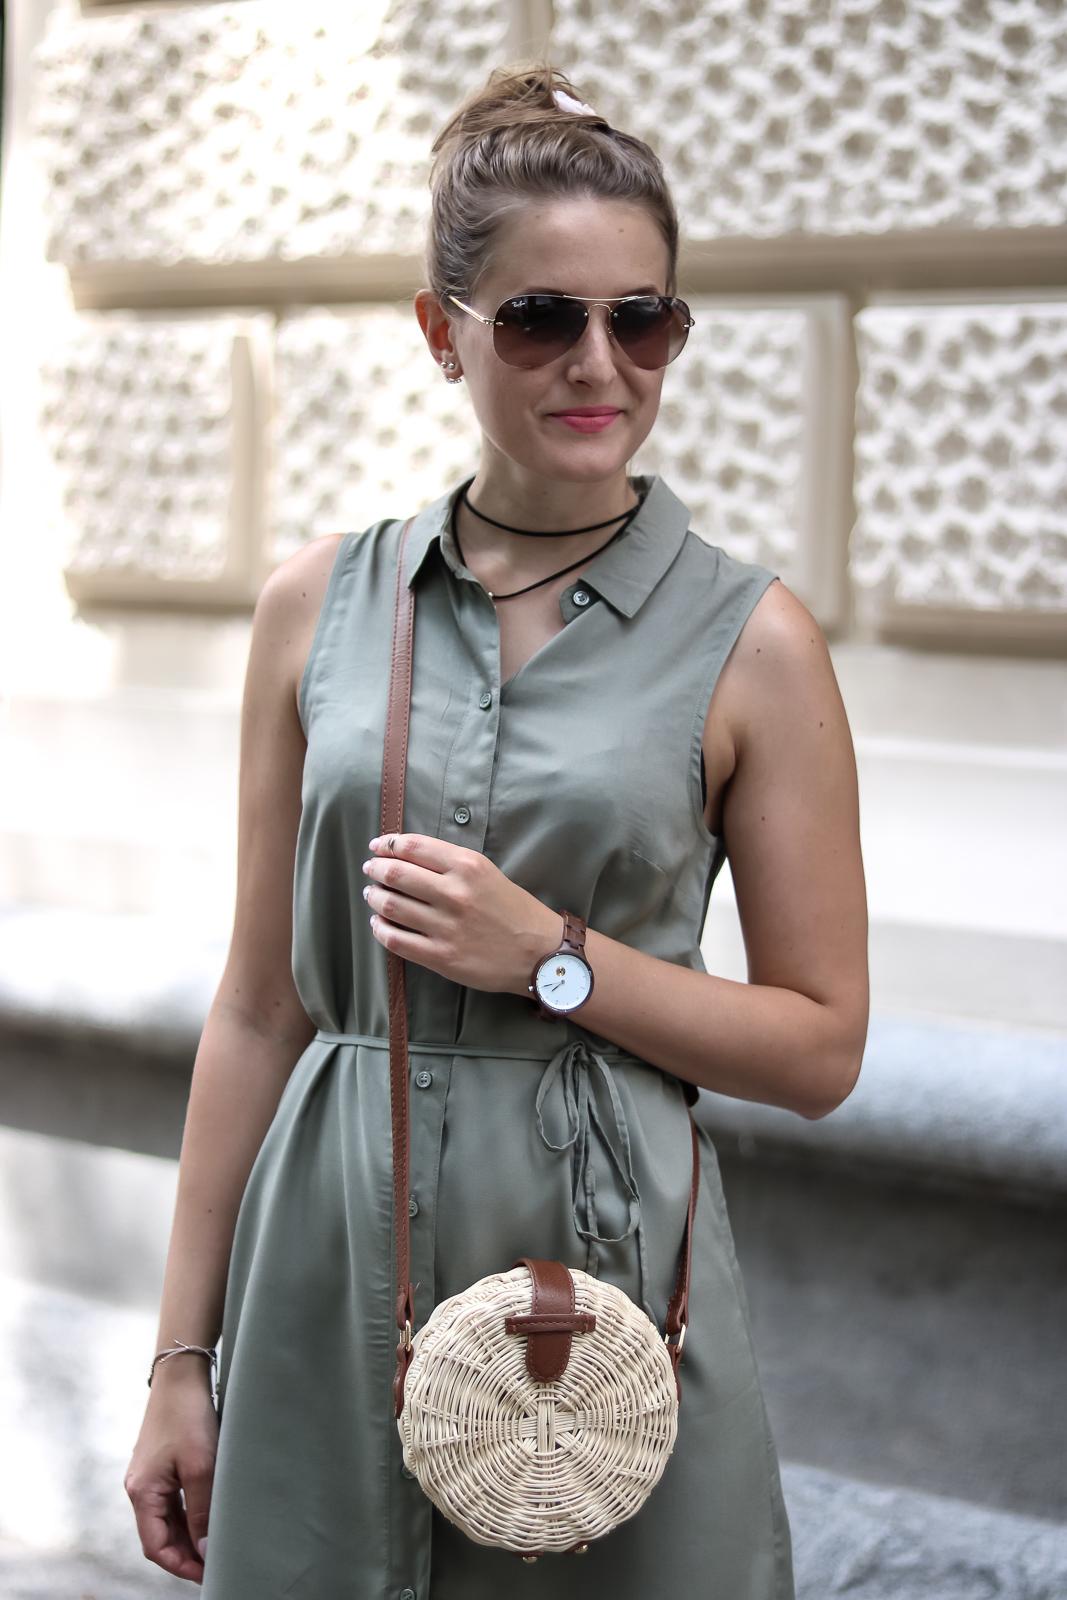 Safari Style meets City - Olivgrüne Kleidung kombinieren - Safari Look Outfit Kombination - Grünes Kleid kombiniert mit Korbtasche und Sandalen - Modetipps - Fashionladyloves by Tamara Wagner - Fashionblog - Mode Blog